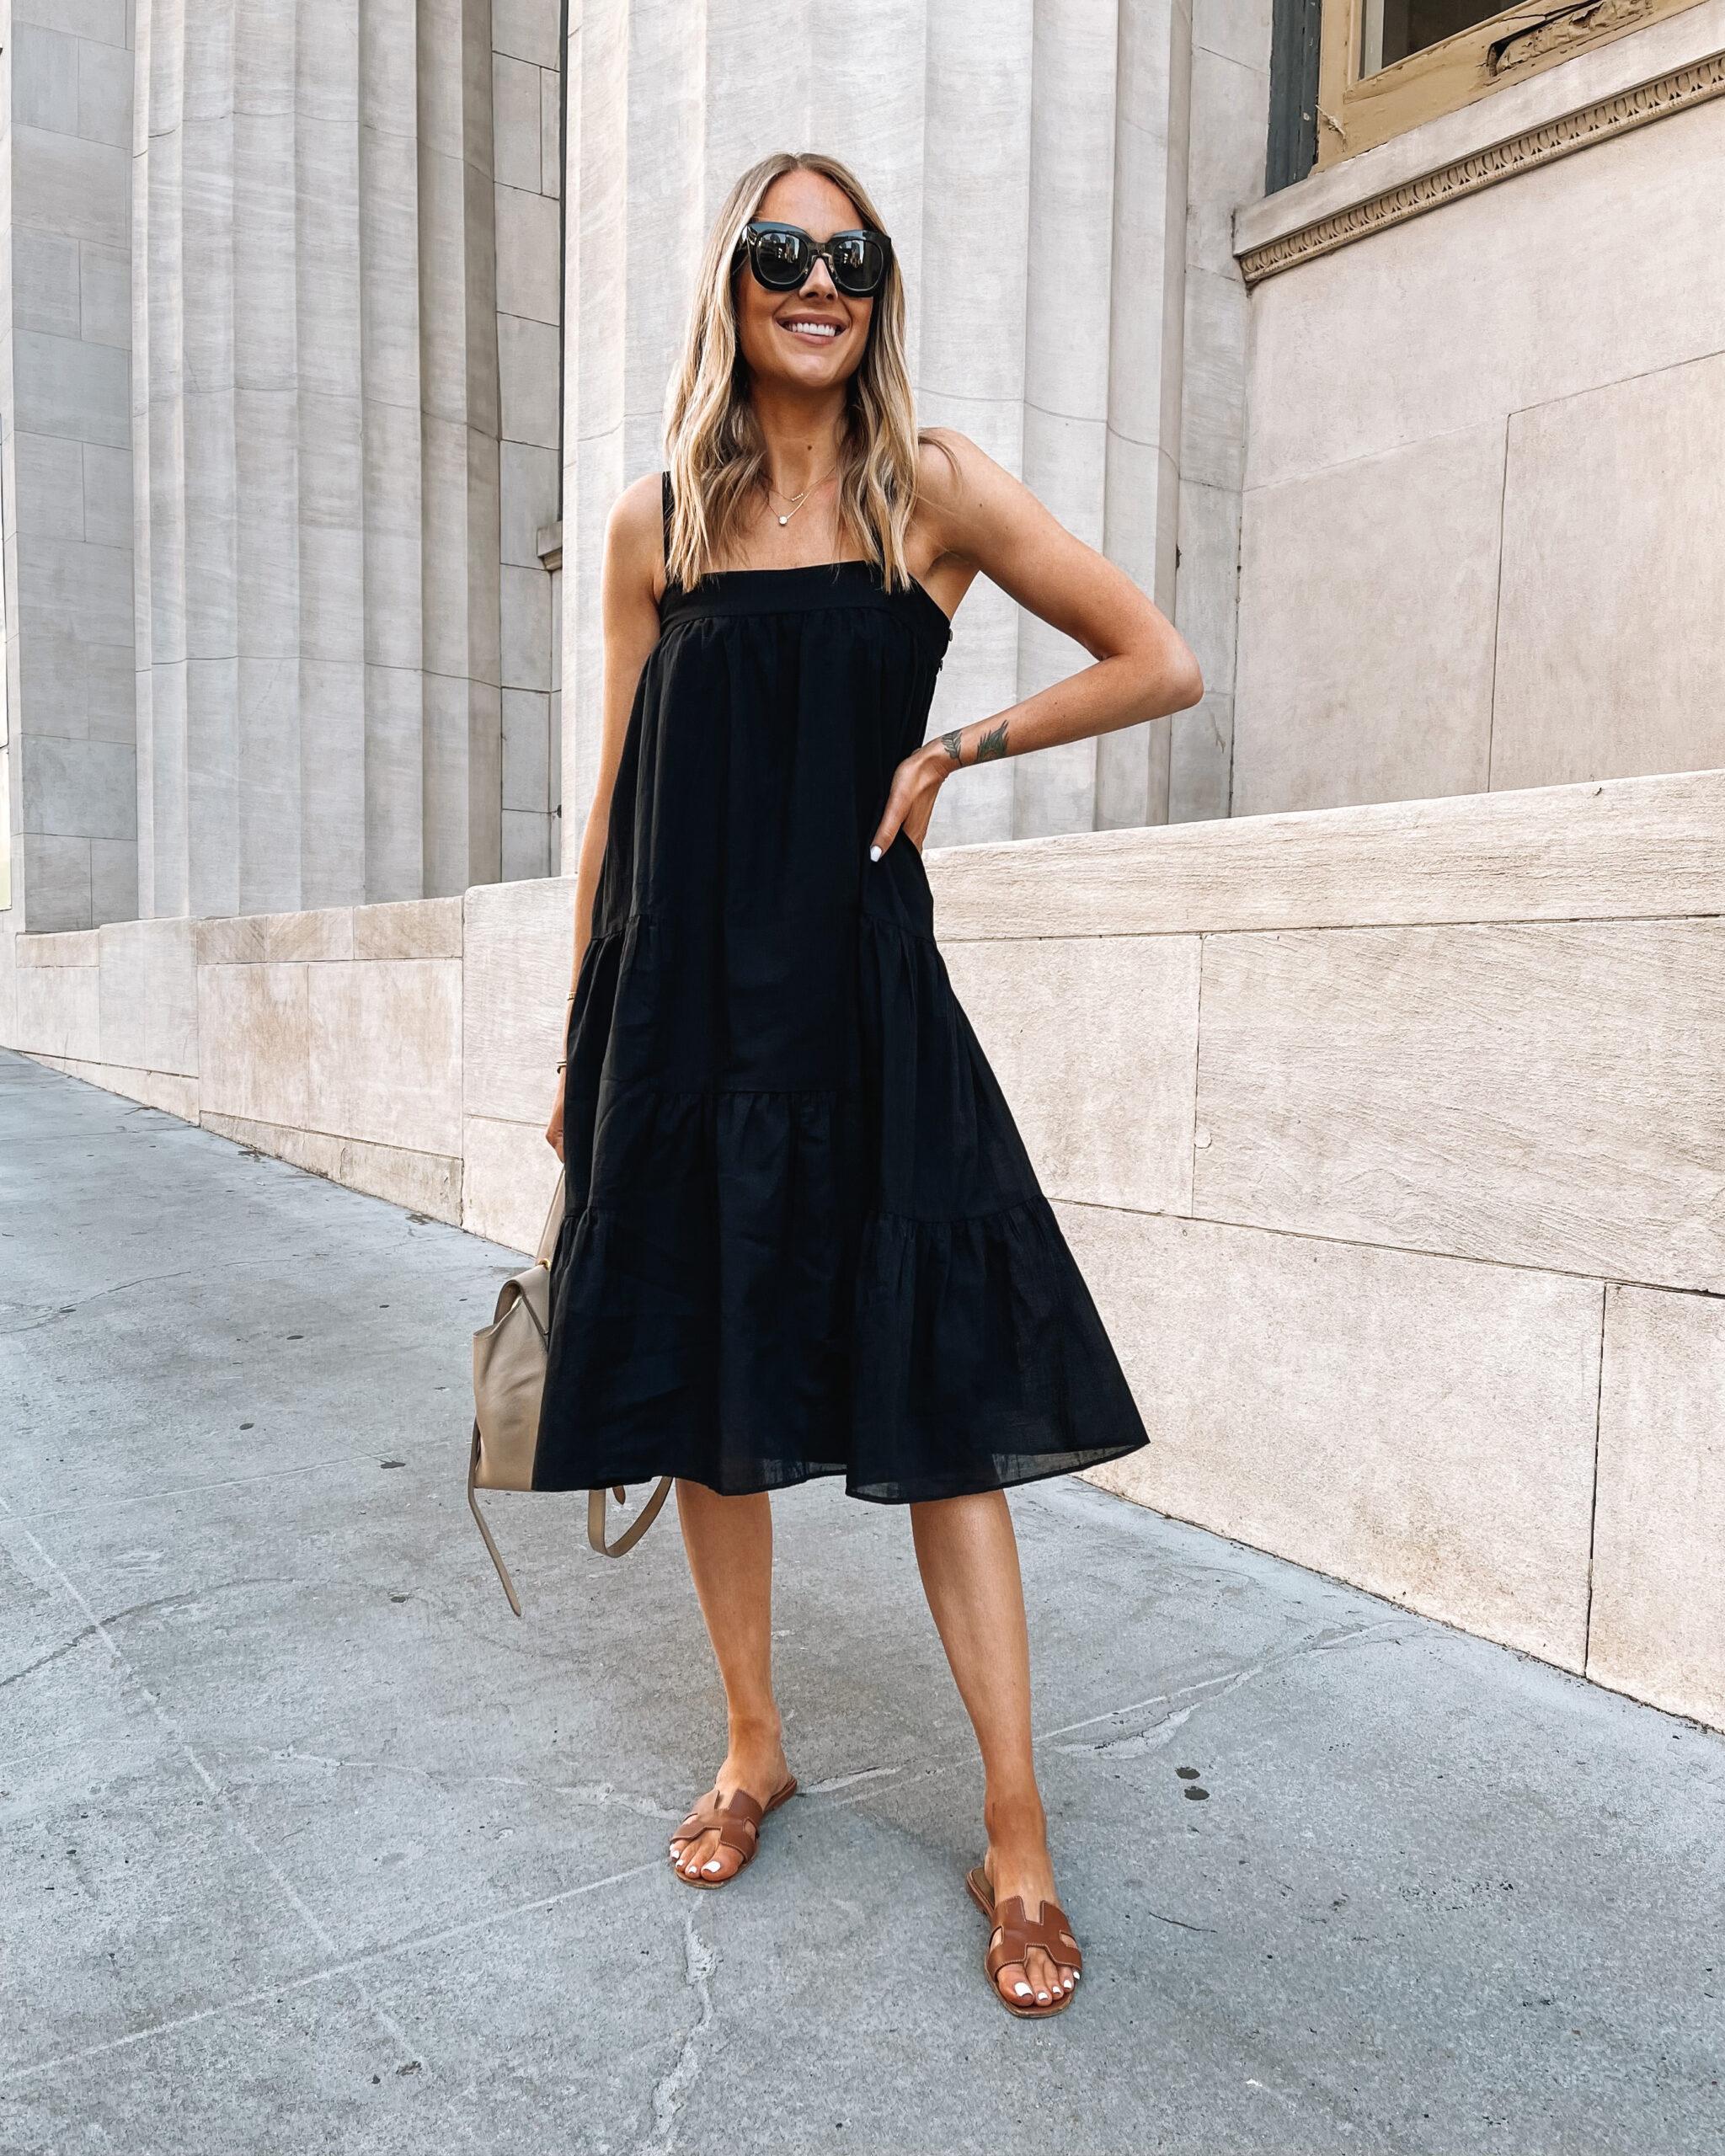 Fashion Jackson Wearing Jenni Kayne Black Summer Dress White Hermes Oran Sandals Summer Dress Outfit